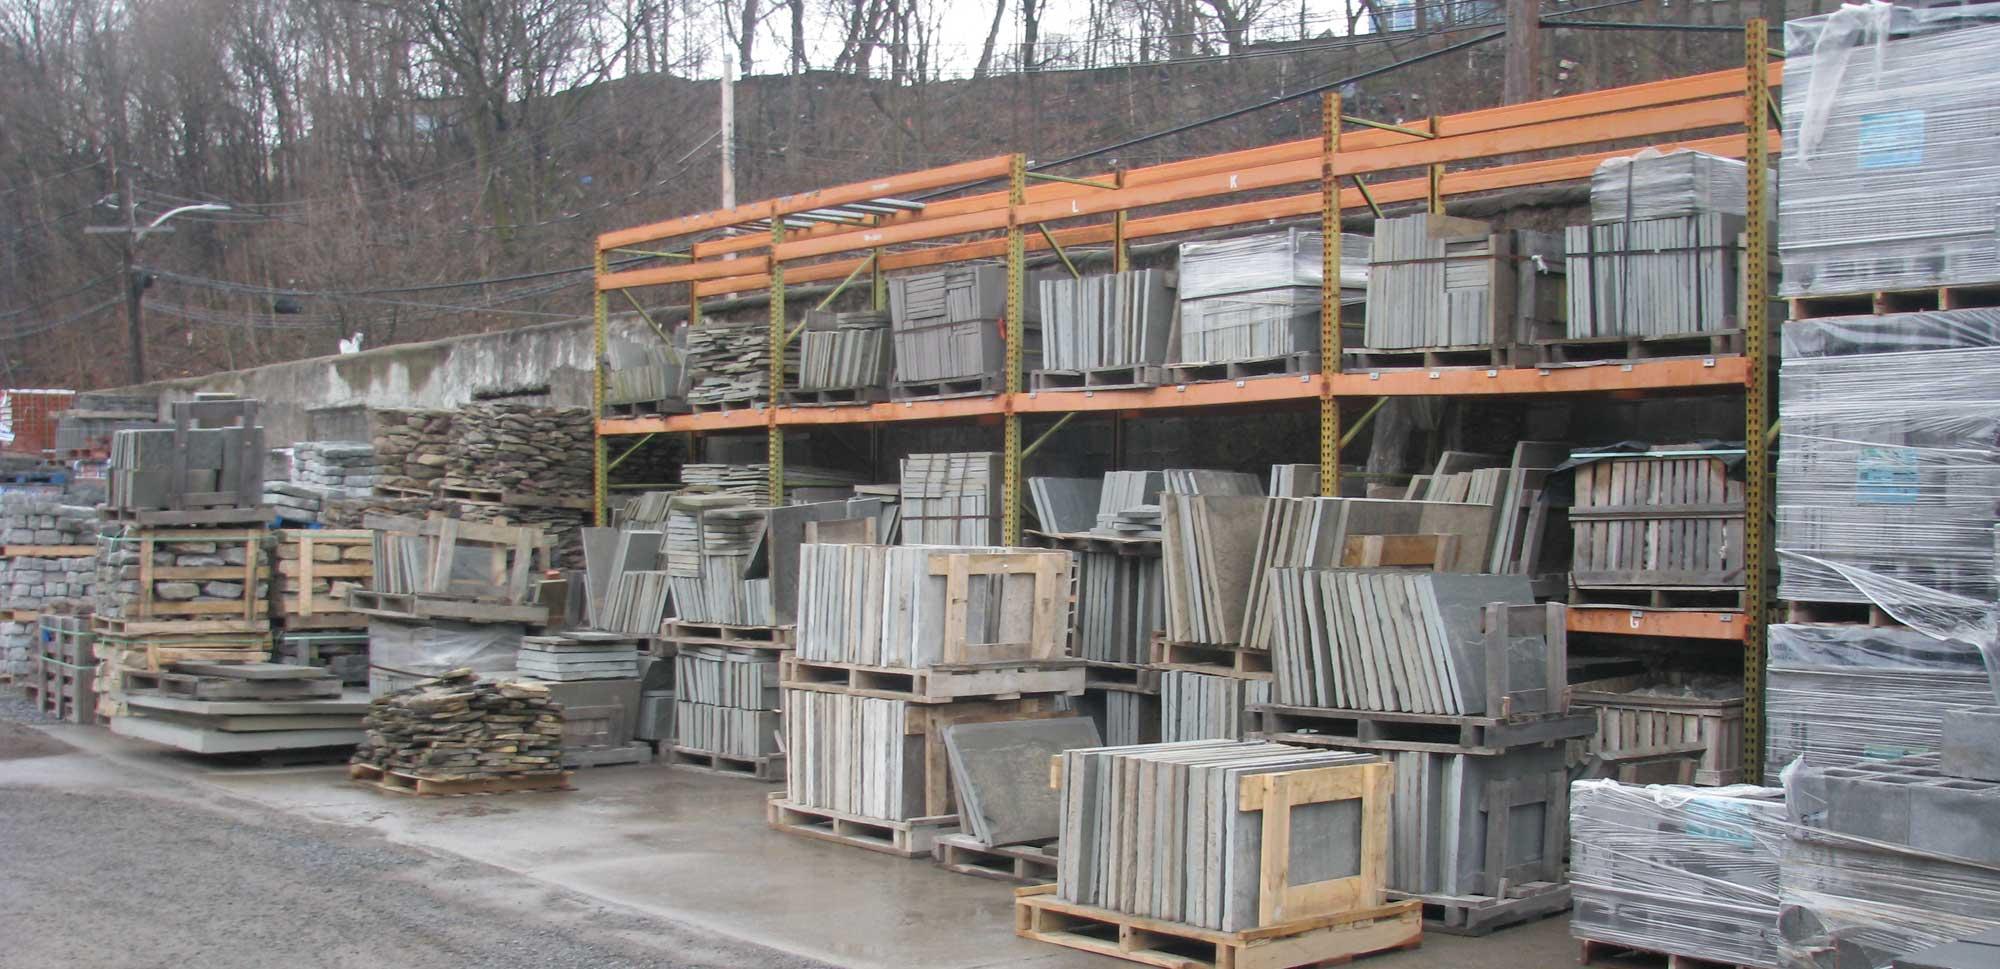 Racks of stone products at Home Mason Peekskill yard